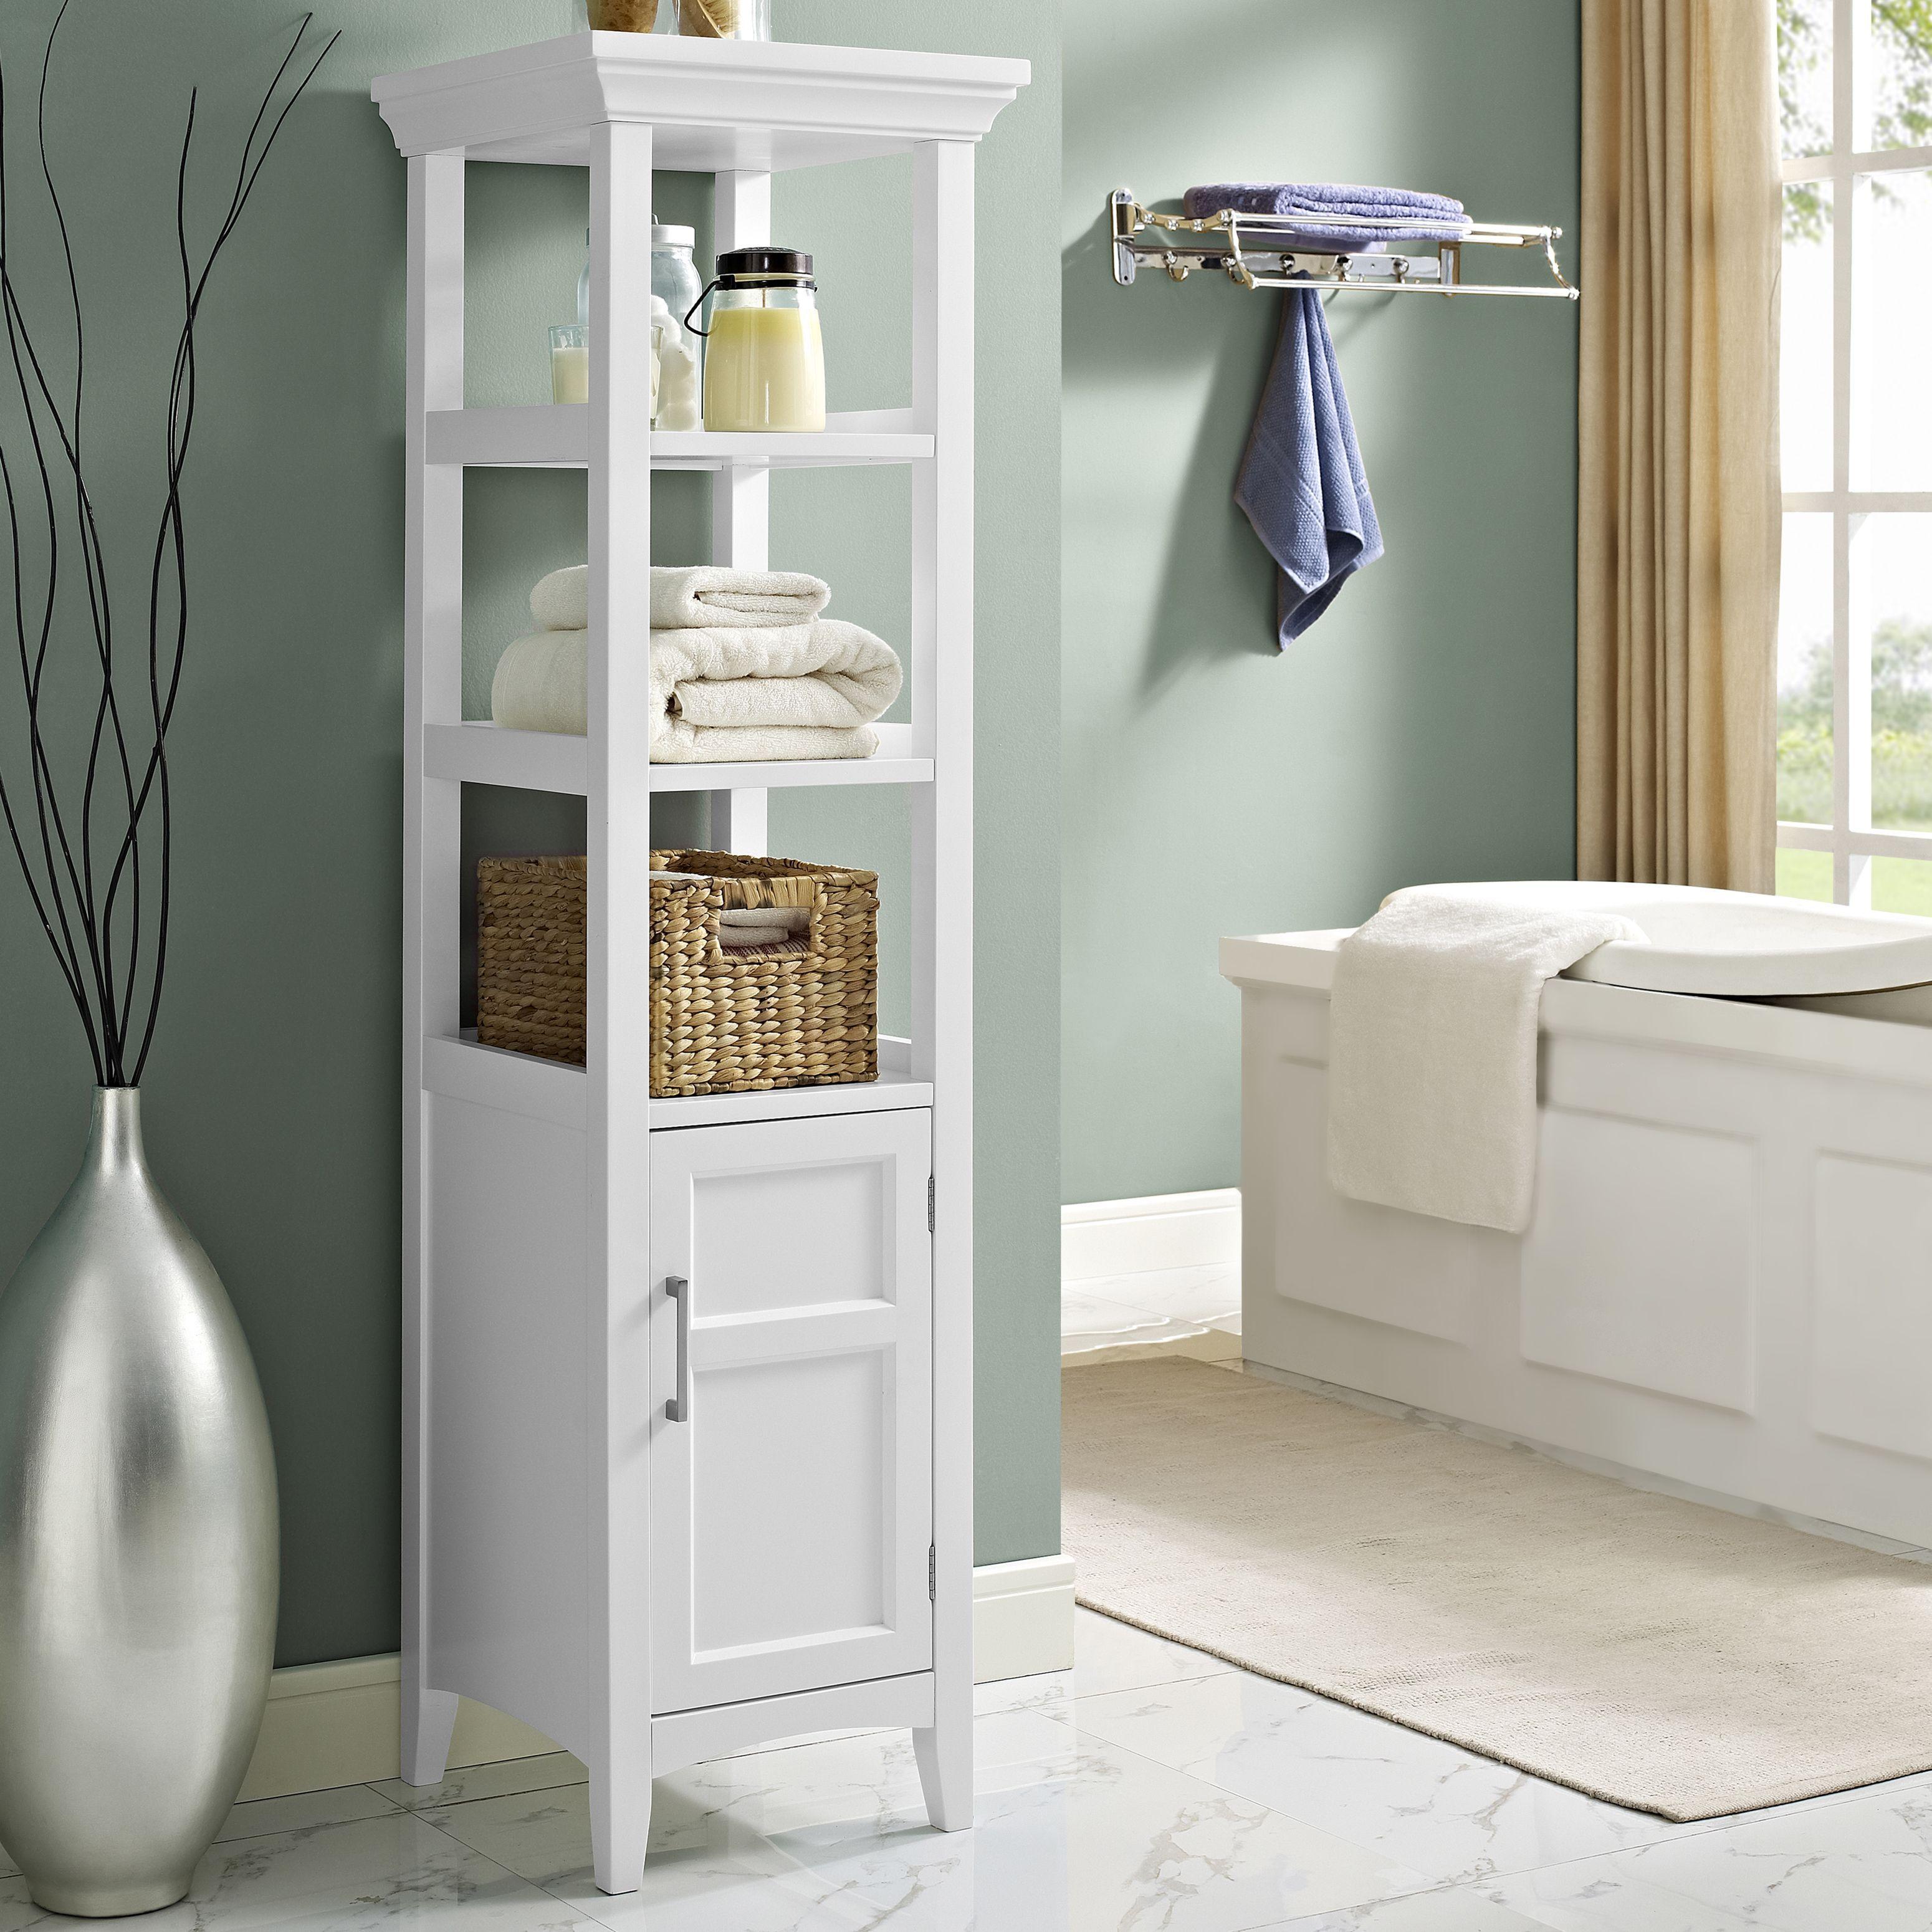 WYNDENHALL Hayes Bath Storage Tower in White | Open shelves, Tower ...